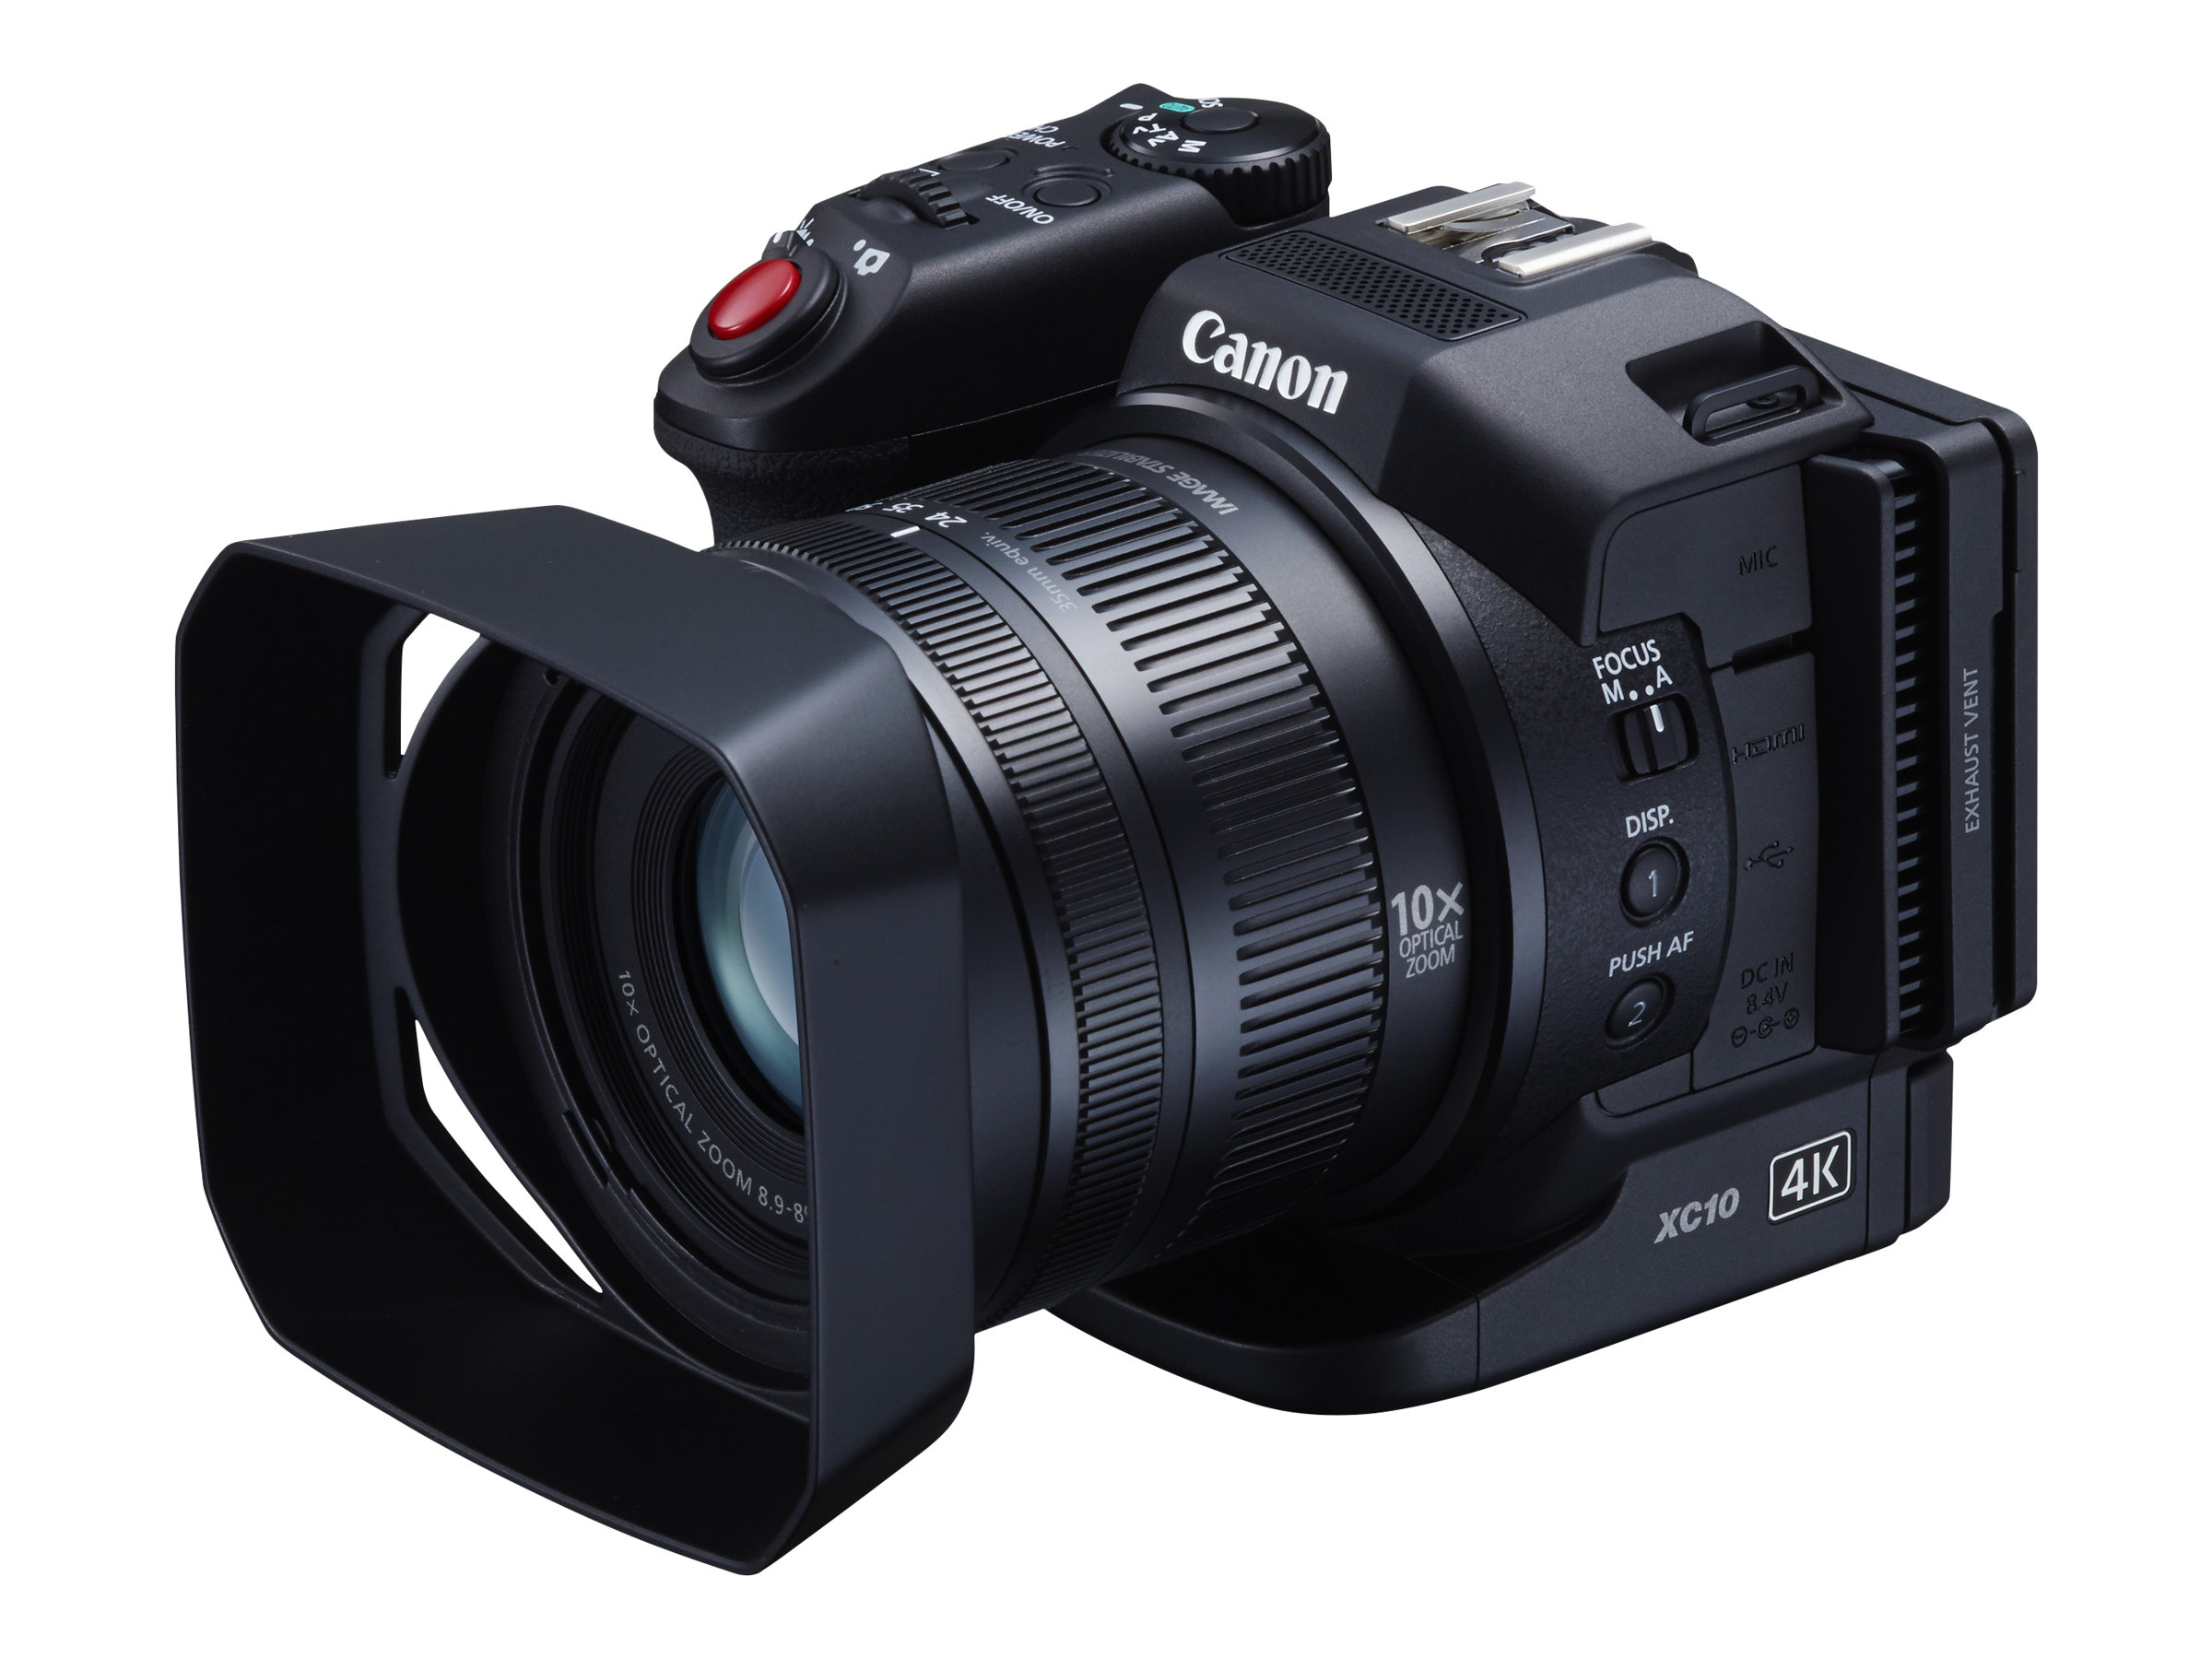 Canon XC10 - Camcorder - 4K - 13.36 MPix - 10x optischer Zoom - Flash-Karte